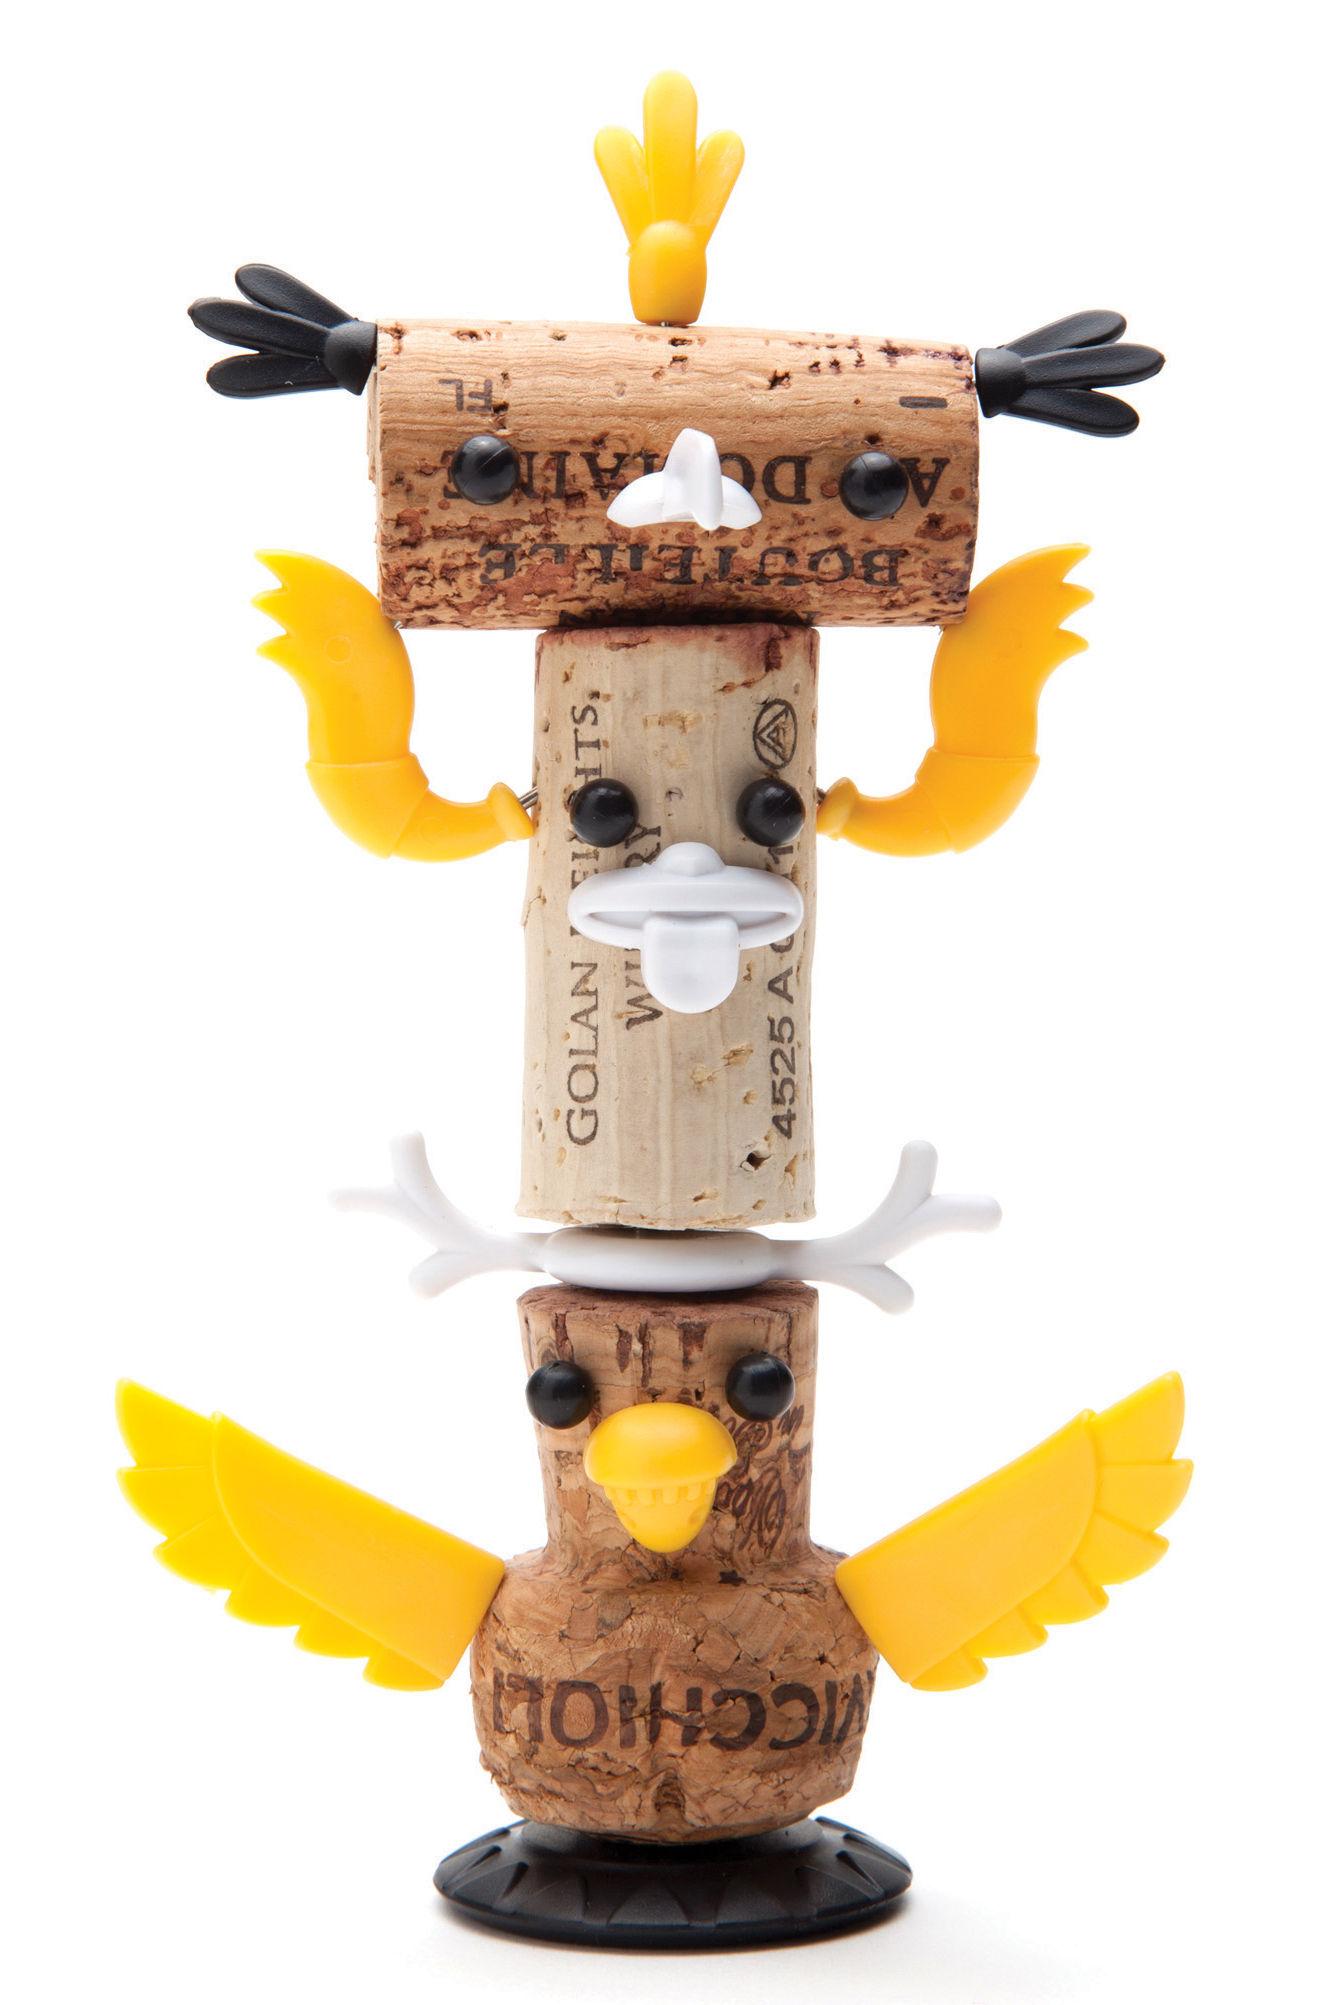 D coration corkers totem pour bouchons de li ge multicolore pa design made in design - Deco table multicolore ...